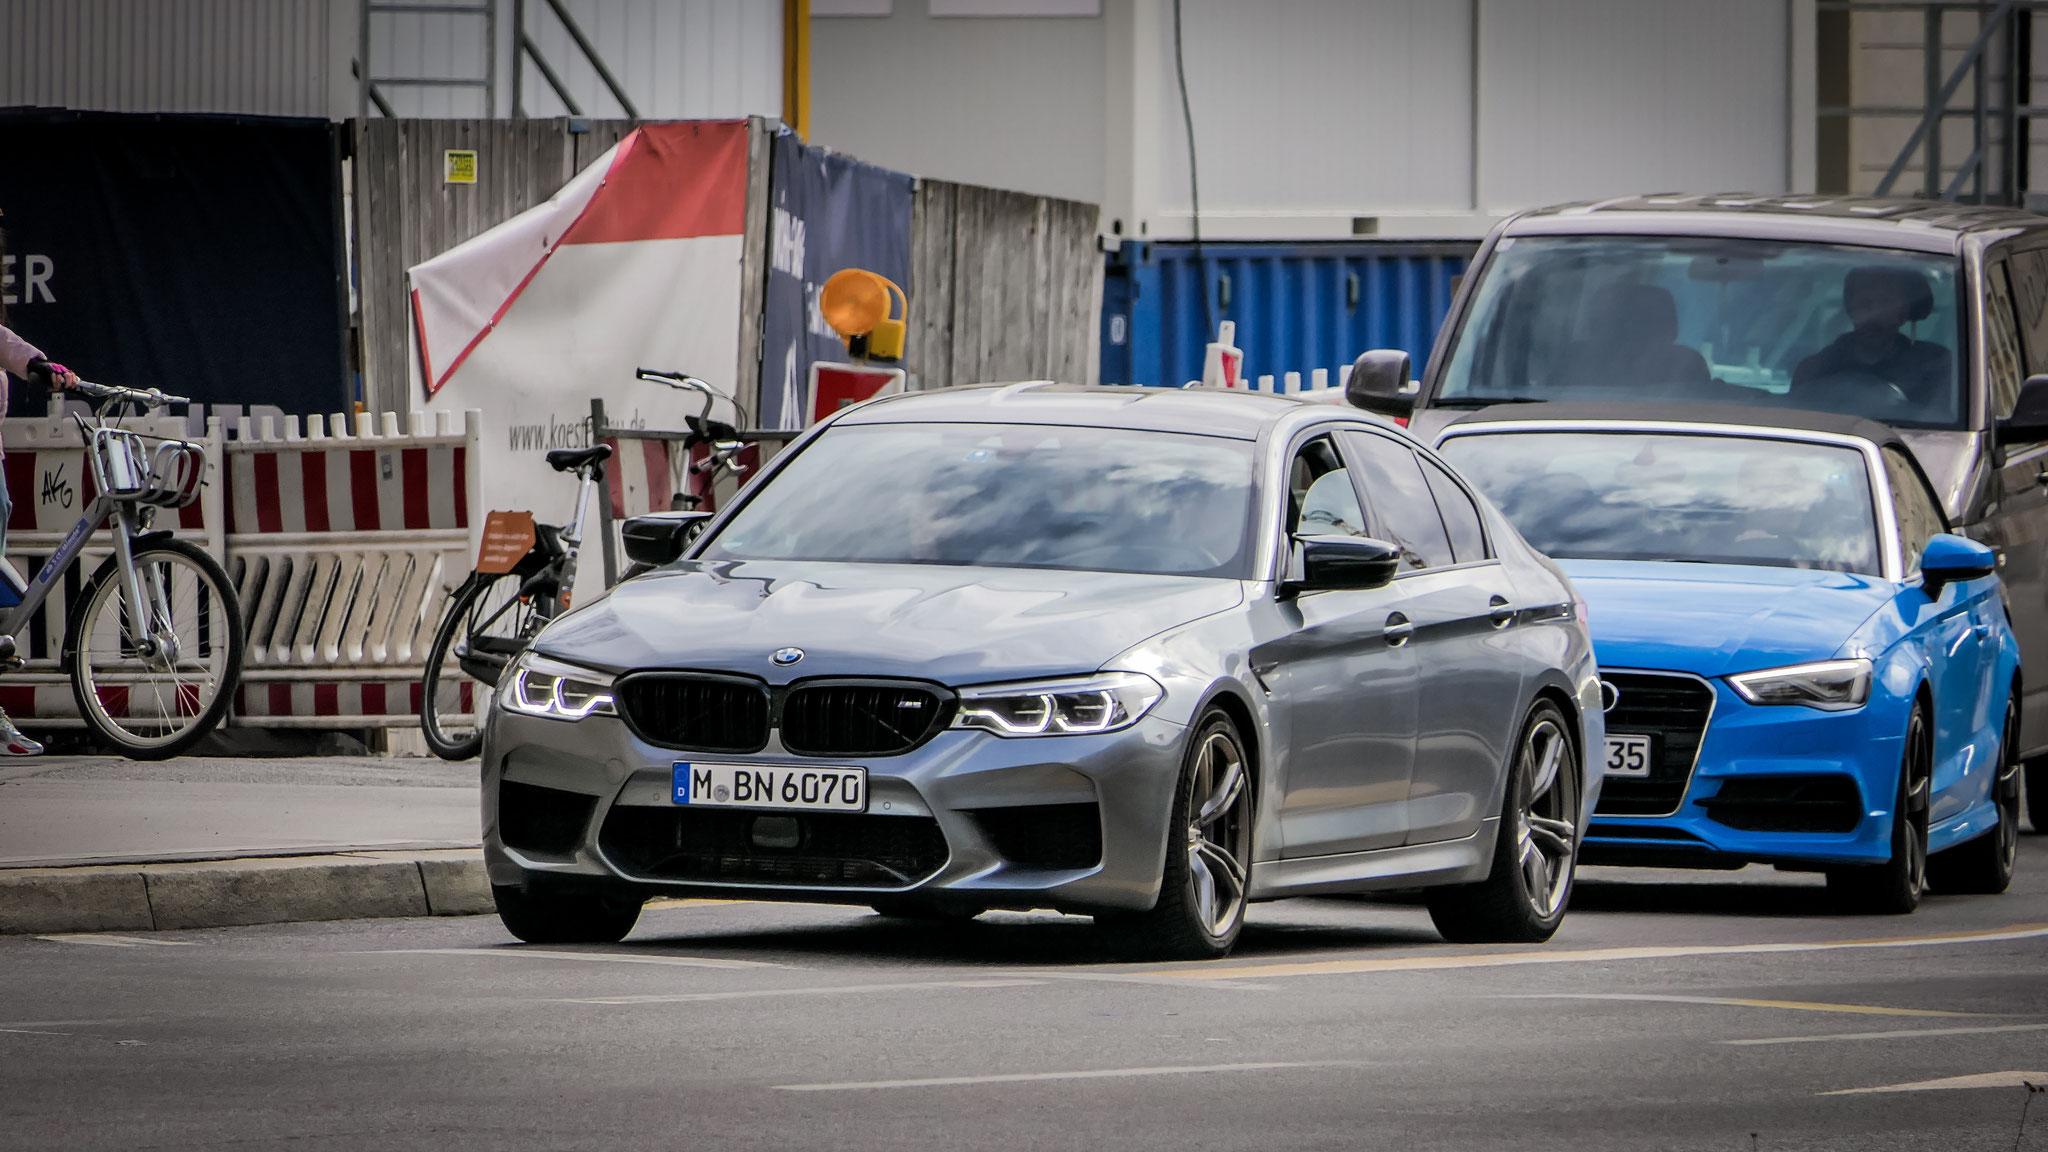 BMW M5 - M-BN-6070